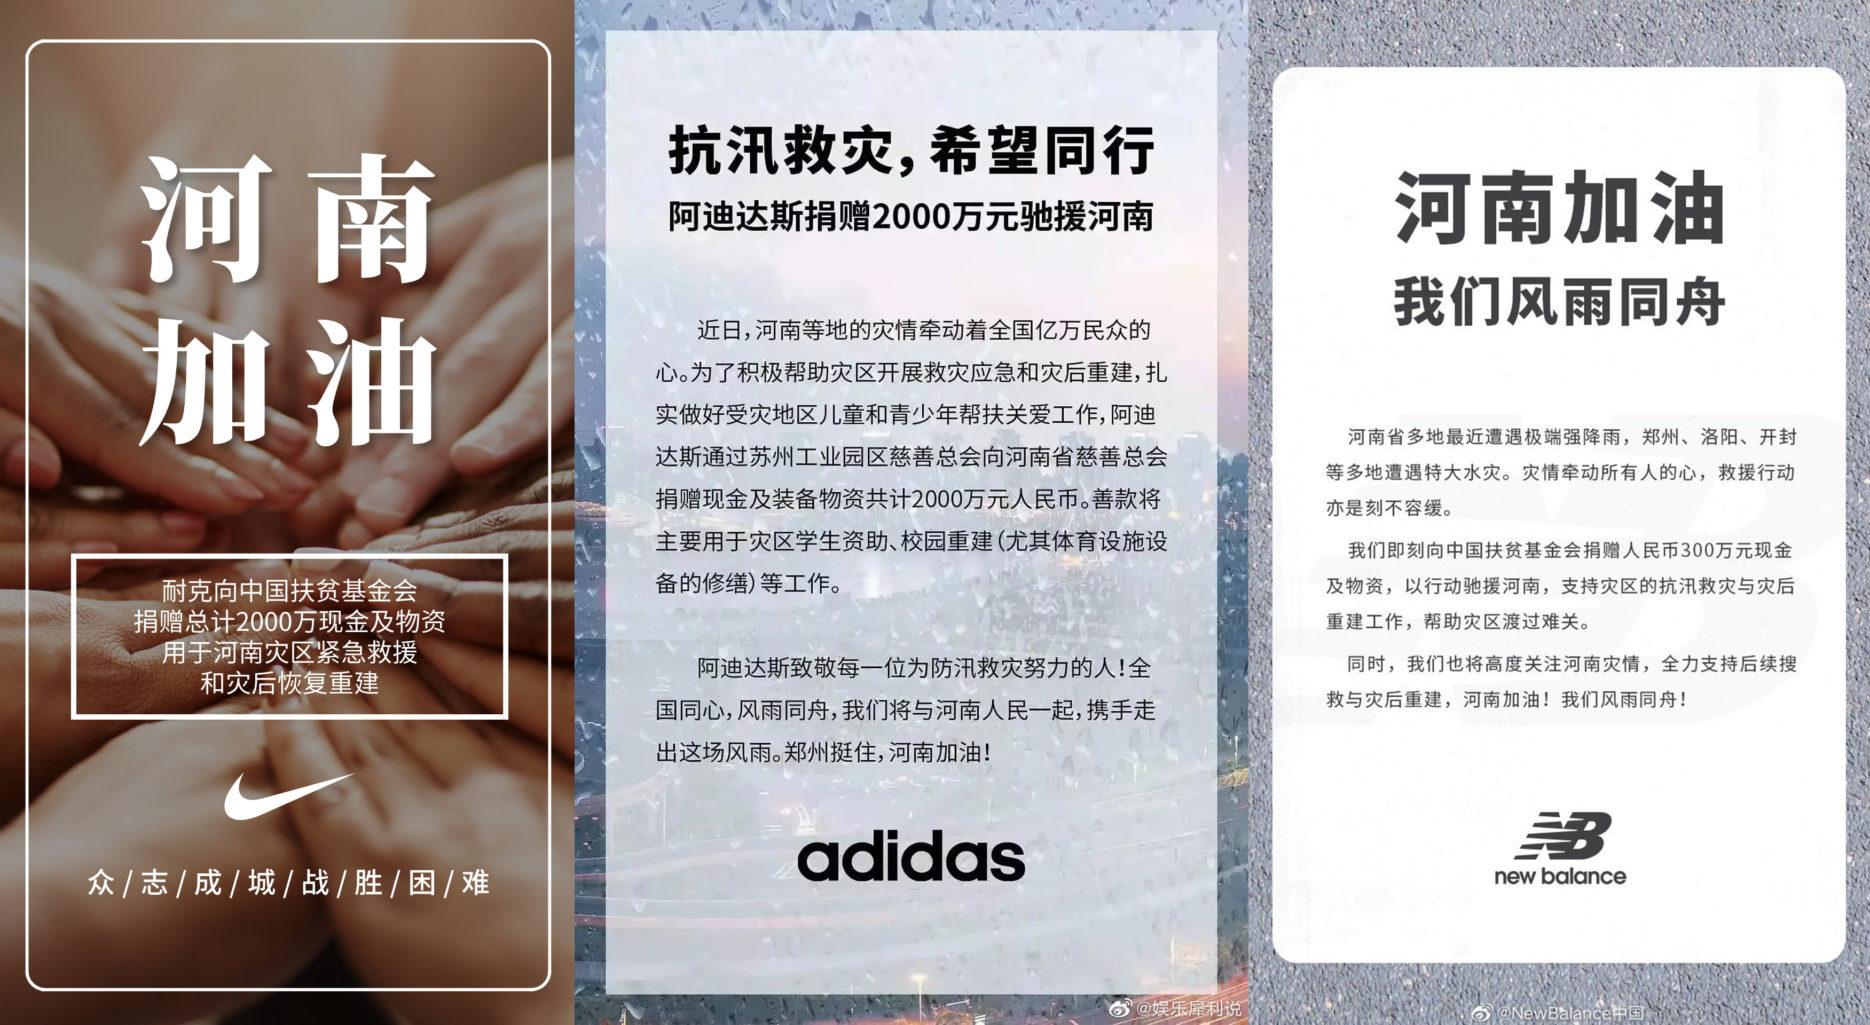 Brand statements about Henan floods